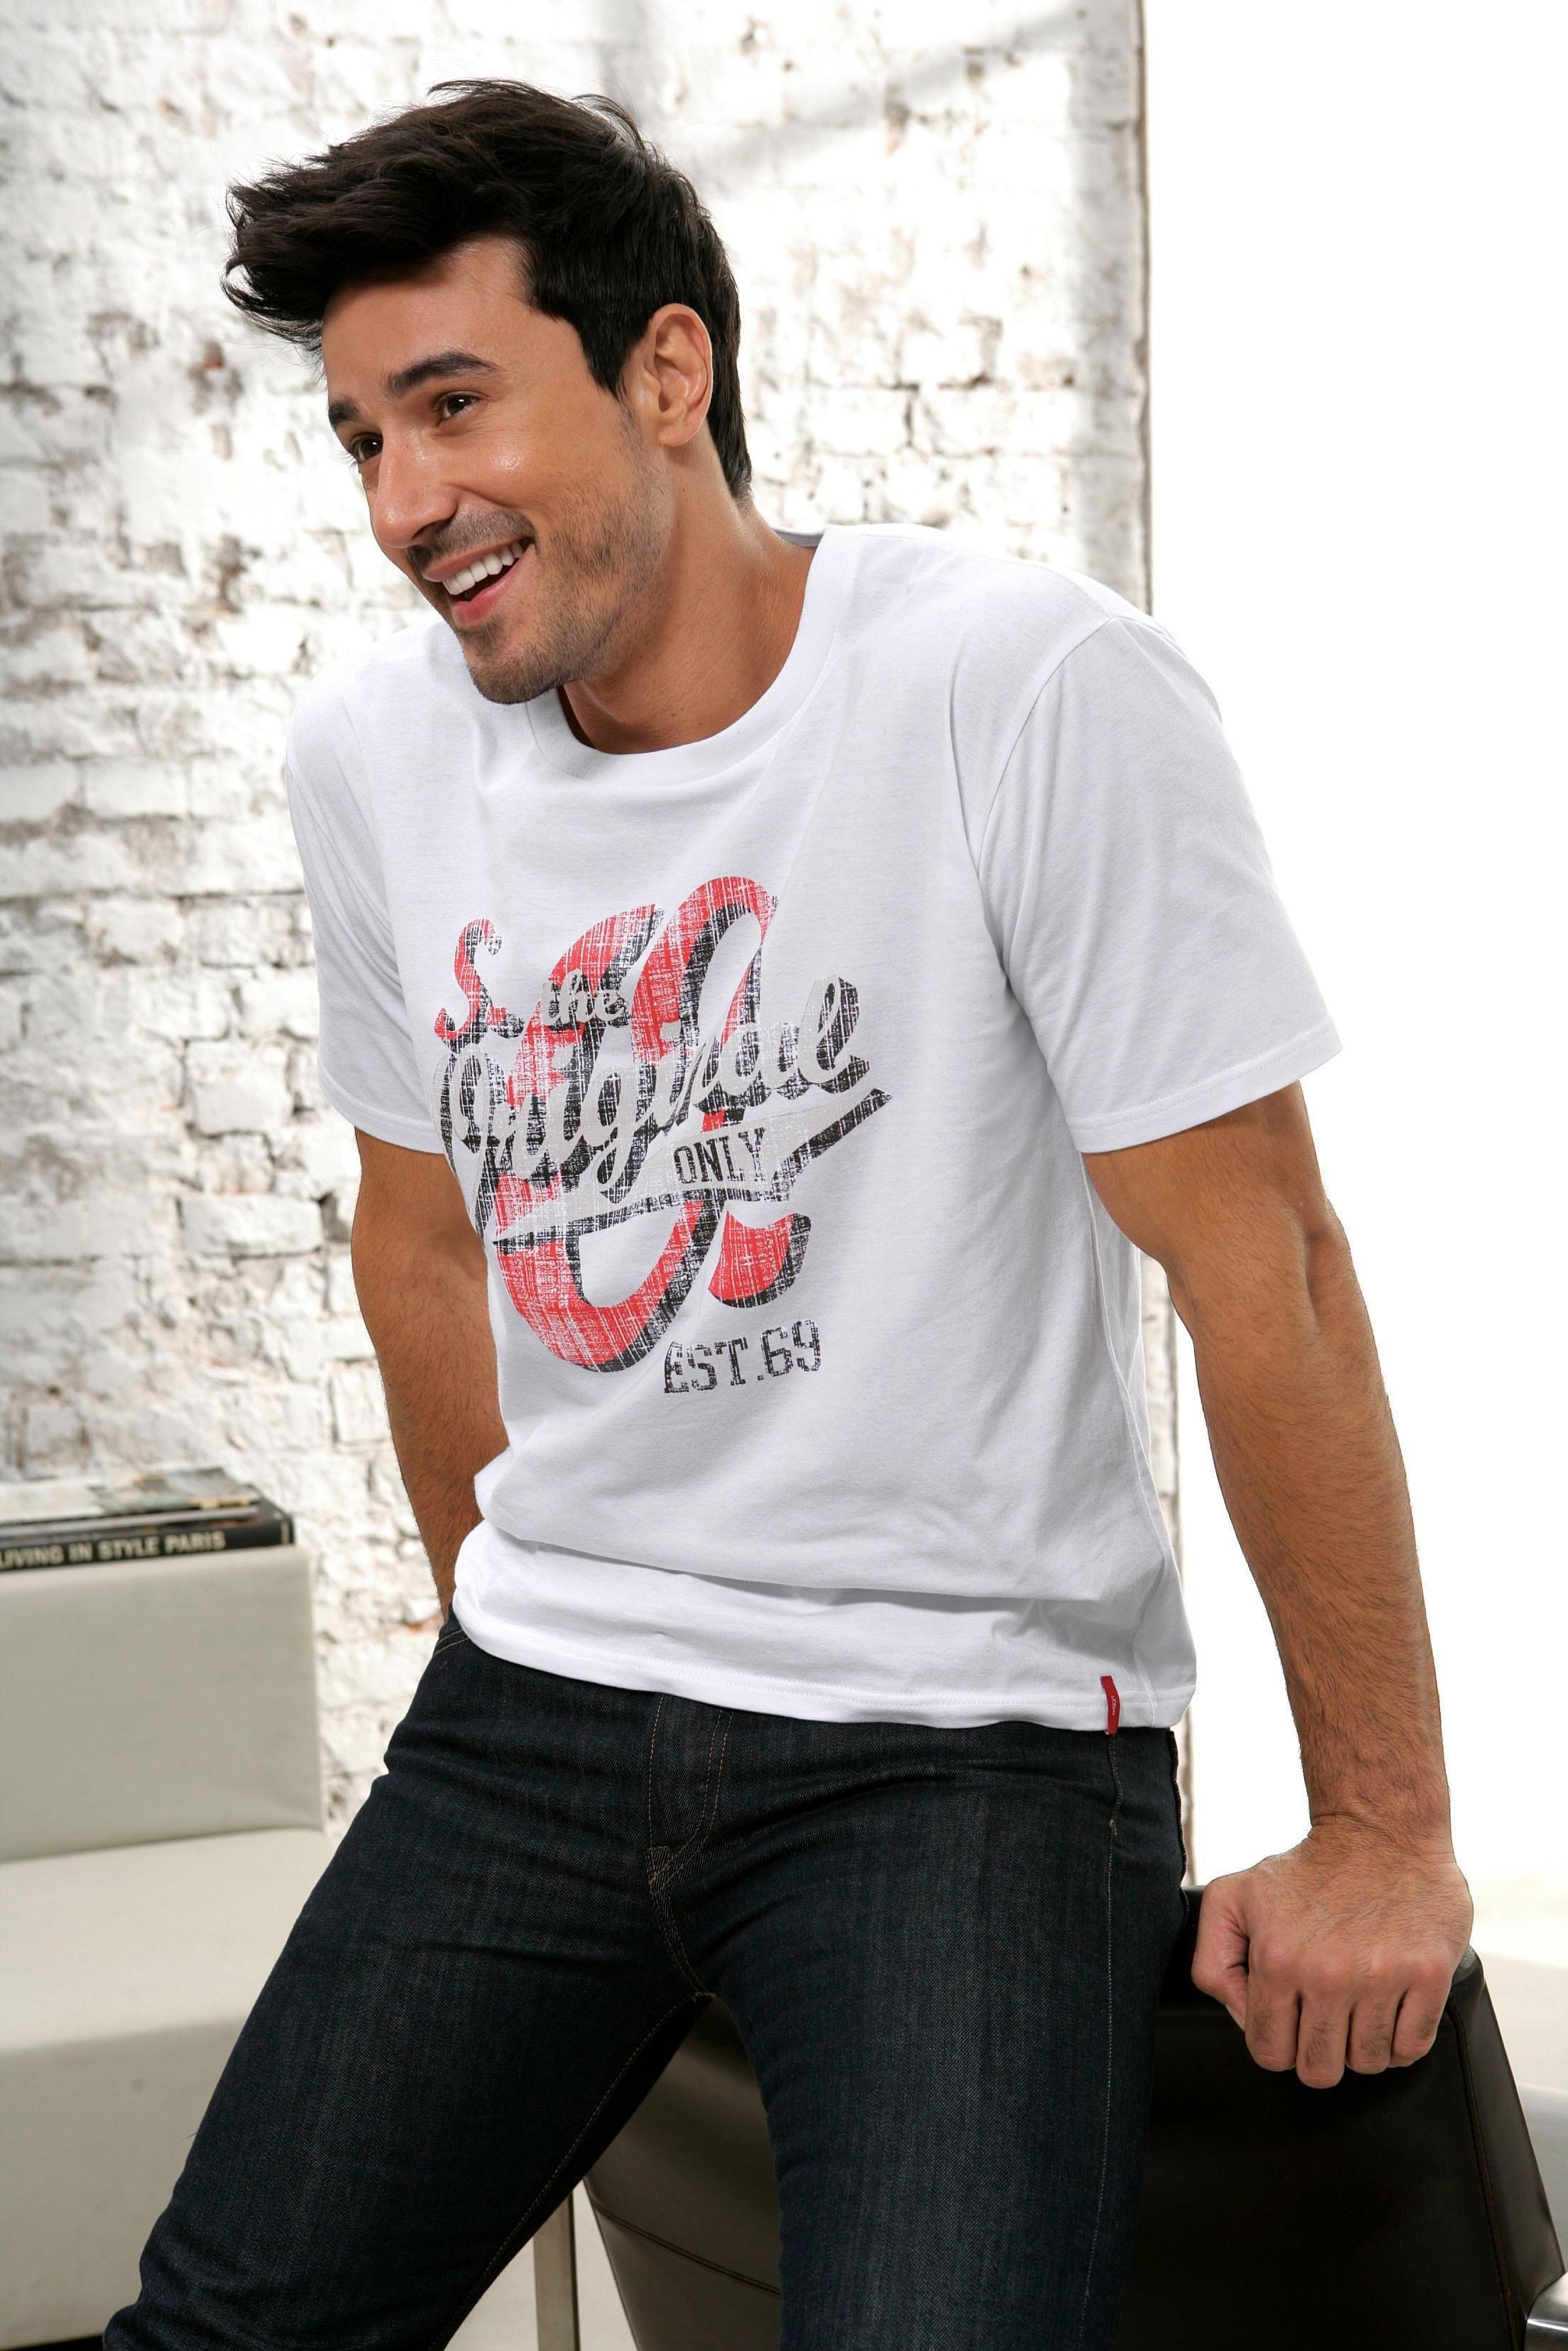 d2a2e09edd1 s.Oliver Bodywear T-shirt